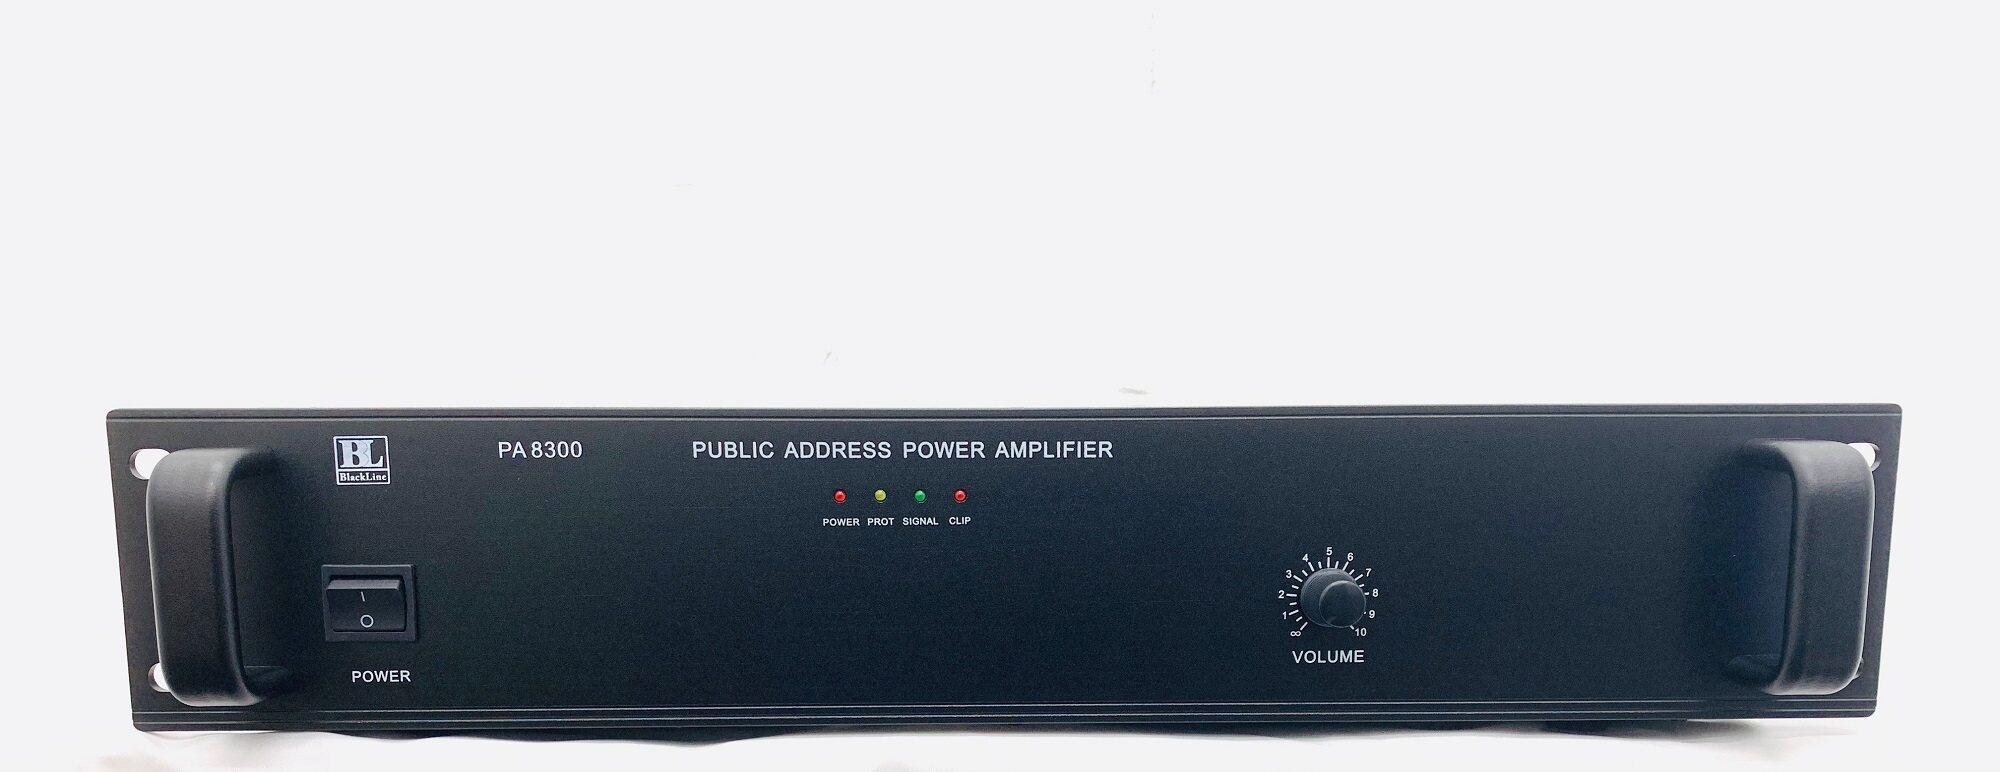 [Ready Stock]Blackline PA8300 300W Public Address PA System Power Amplifier